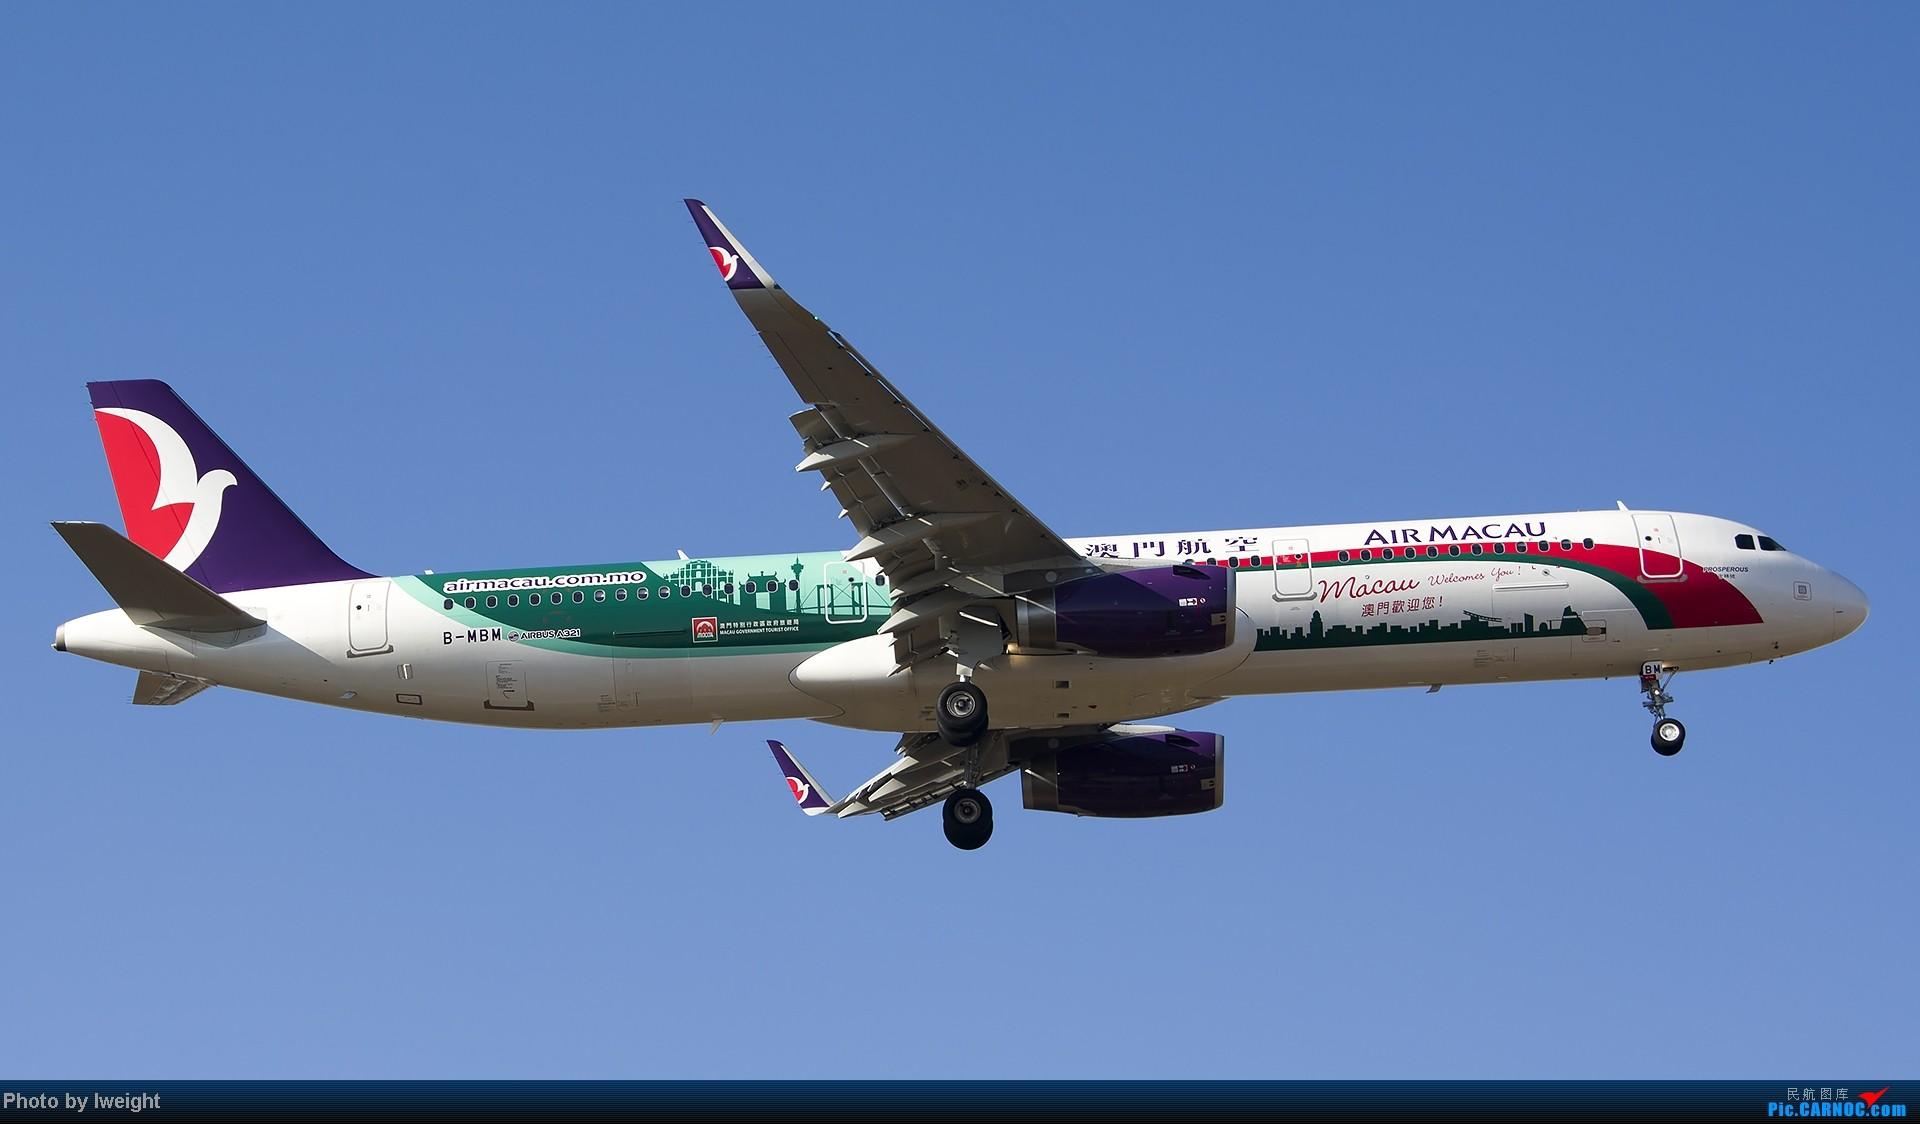 Re:[原创]抓住APEC蓝的尾巴,再拍上一组 AIRBUS A321-200 B-MBM 中国北京首都机场